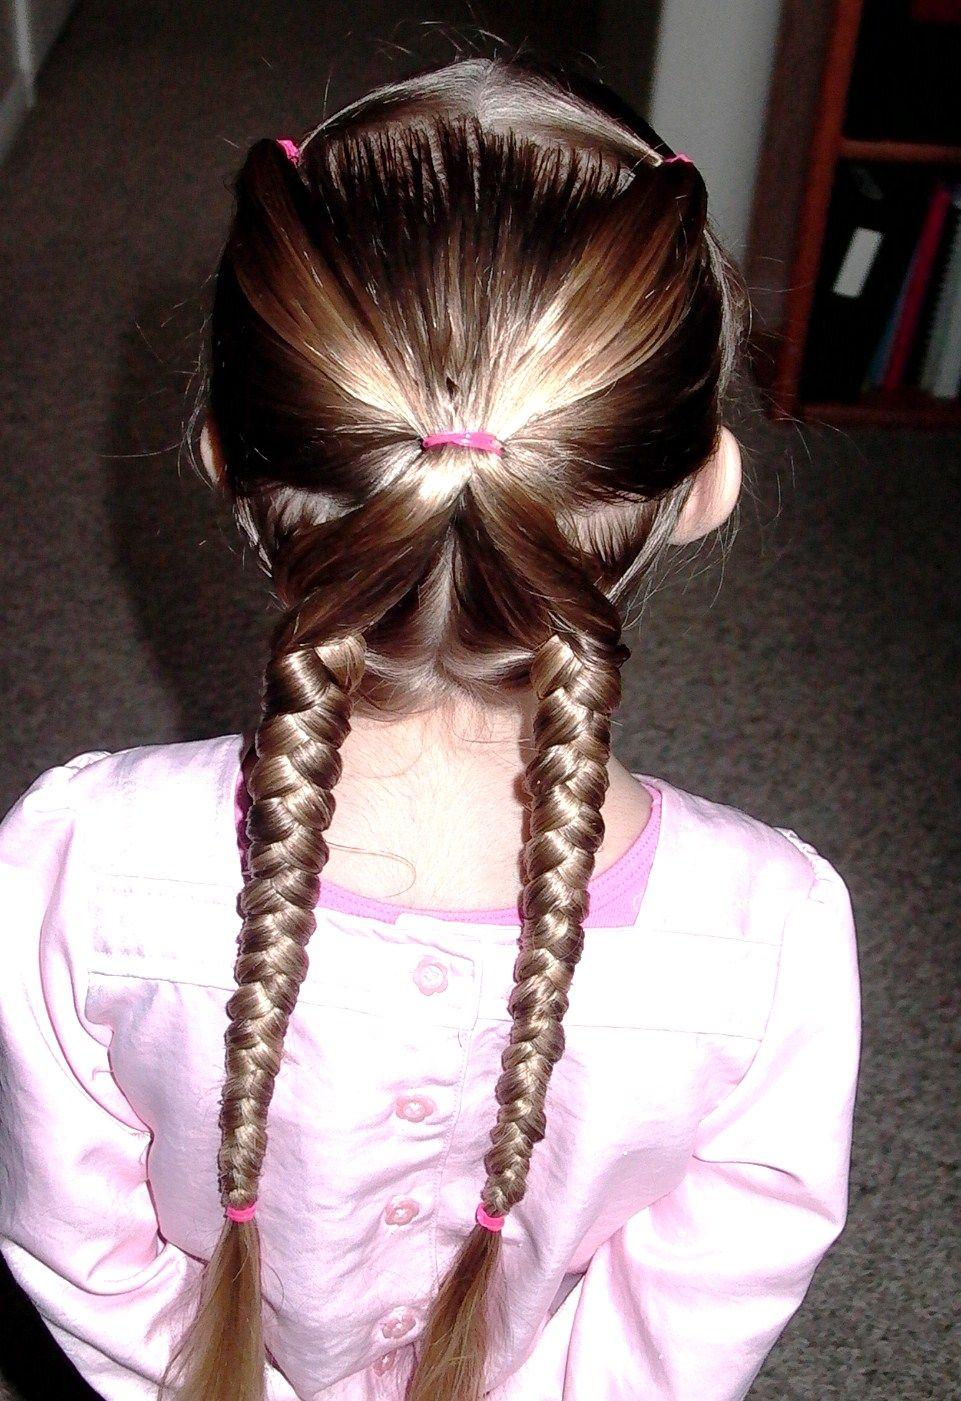 Little girlus hairstyles cute and easy braid hairdo min x